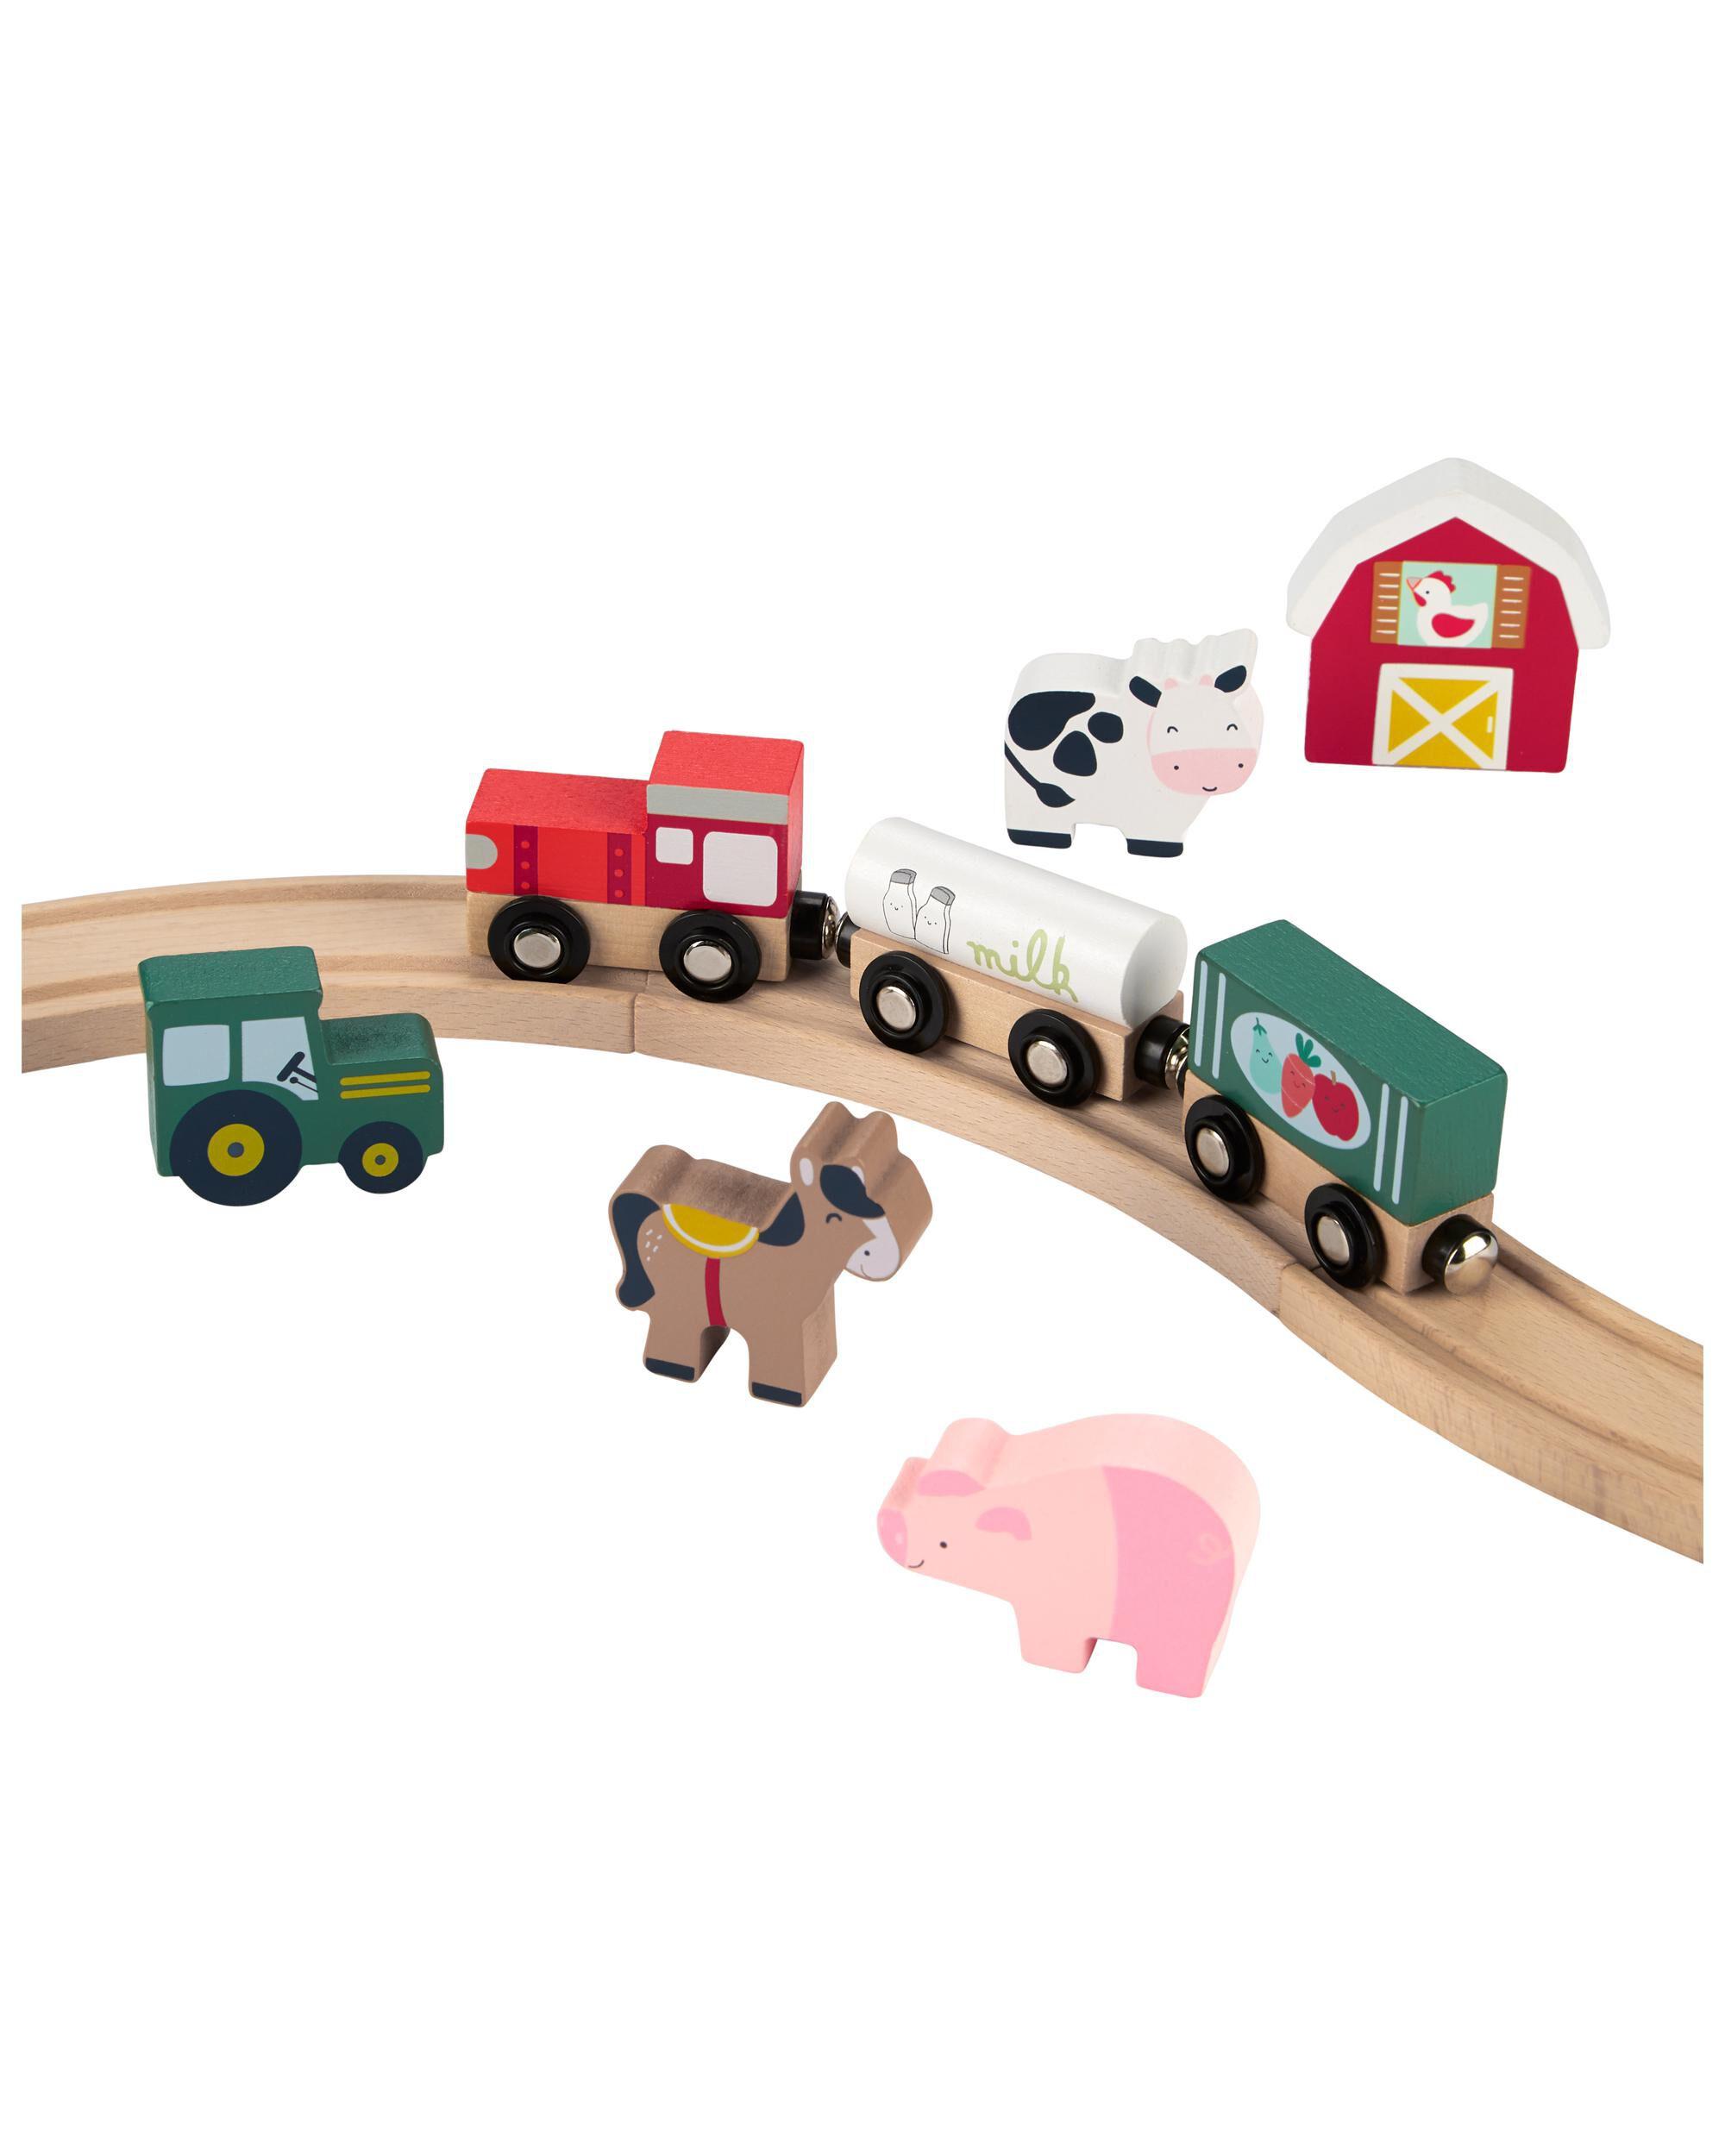 Carters Wooden Animal & Train Set